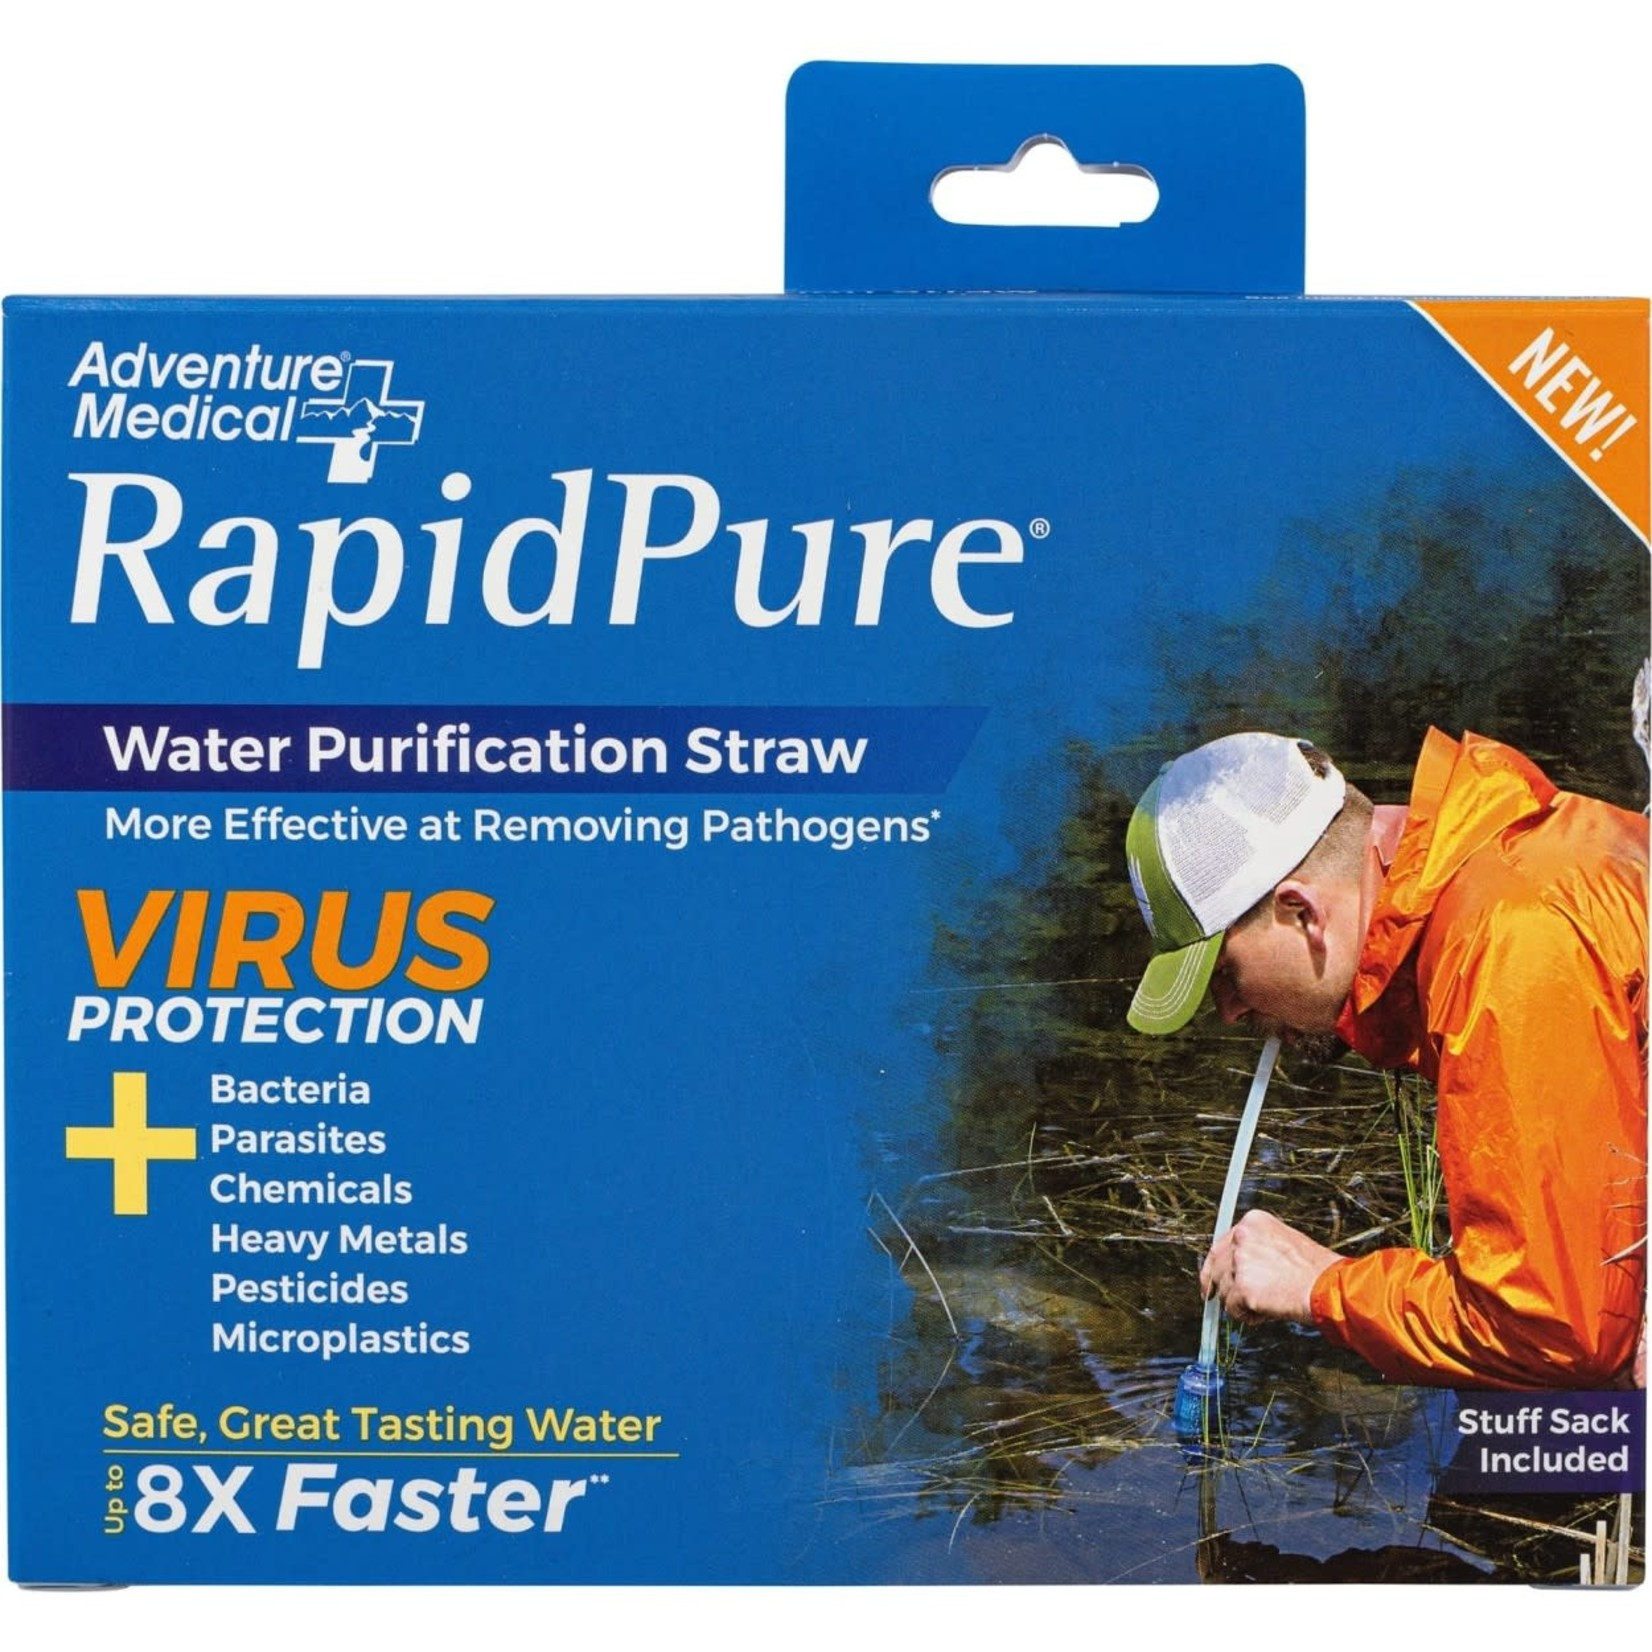 Adventure Medical Kit RapidPure Pioneer Straw